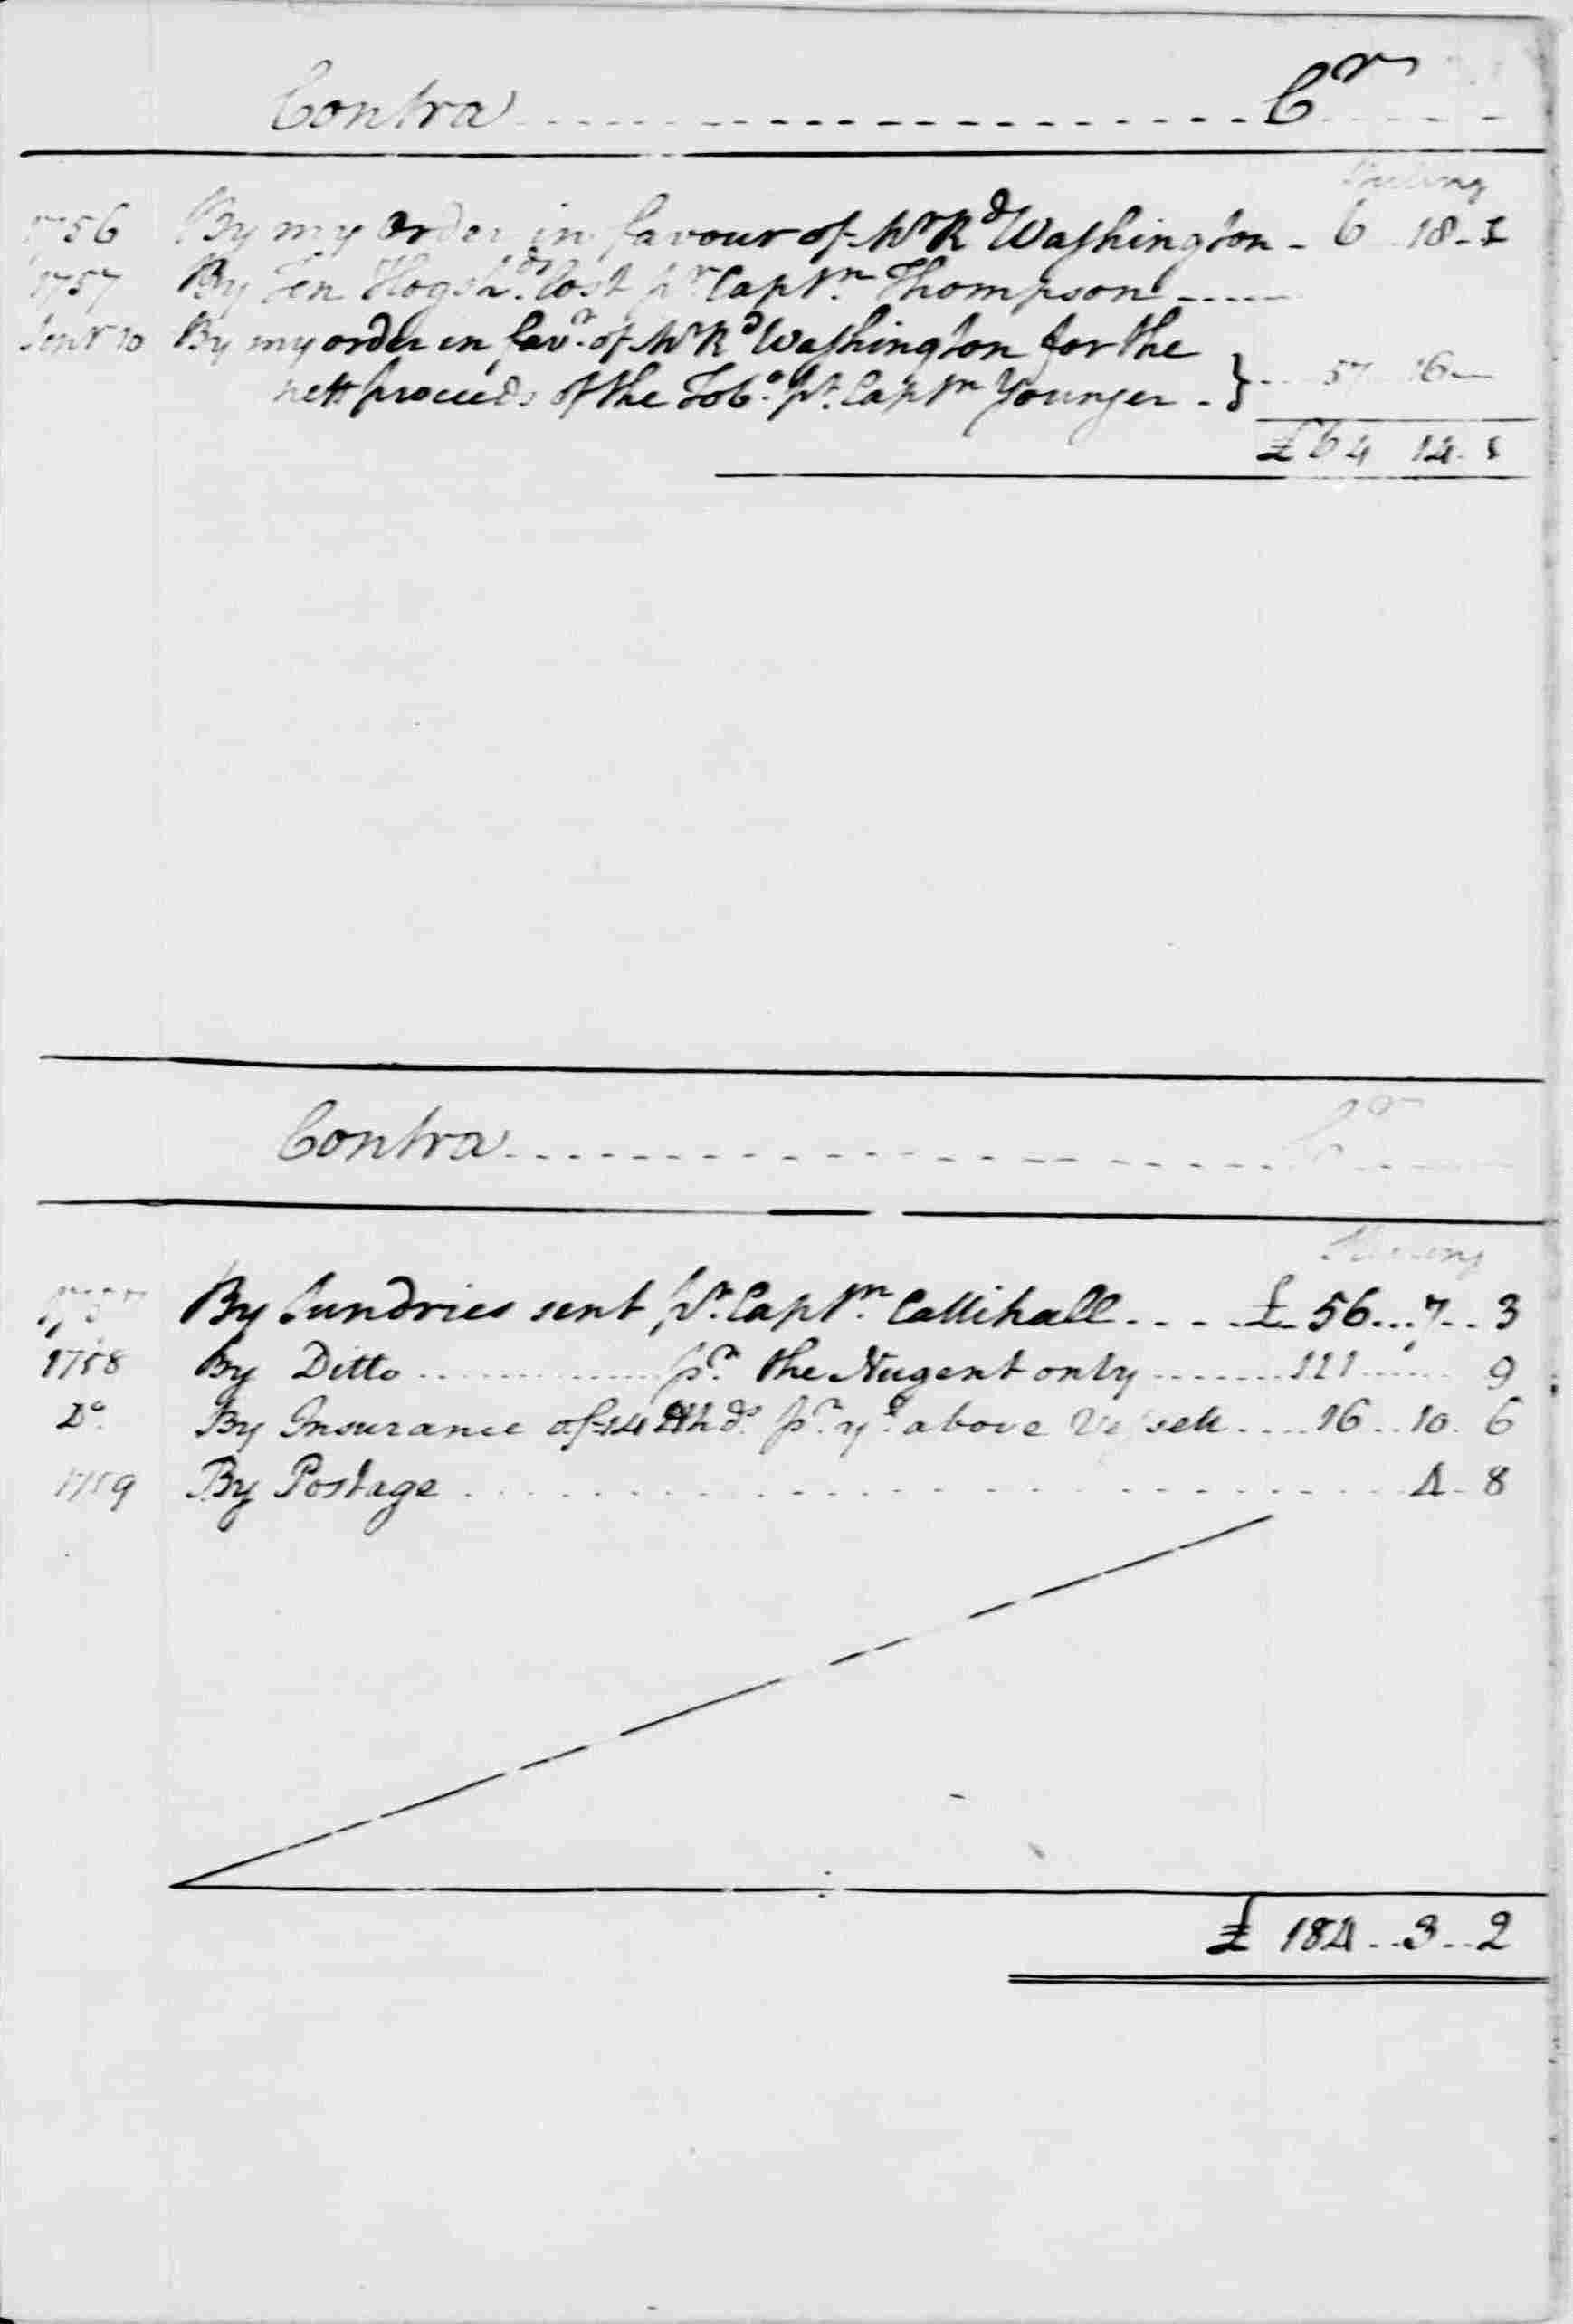 Ledger A, folio 16, right side